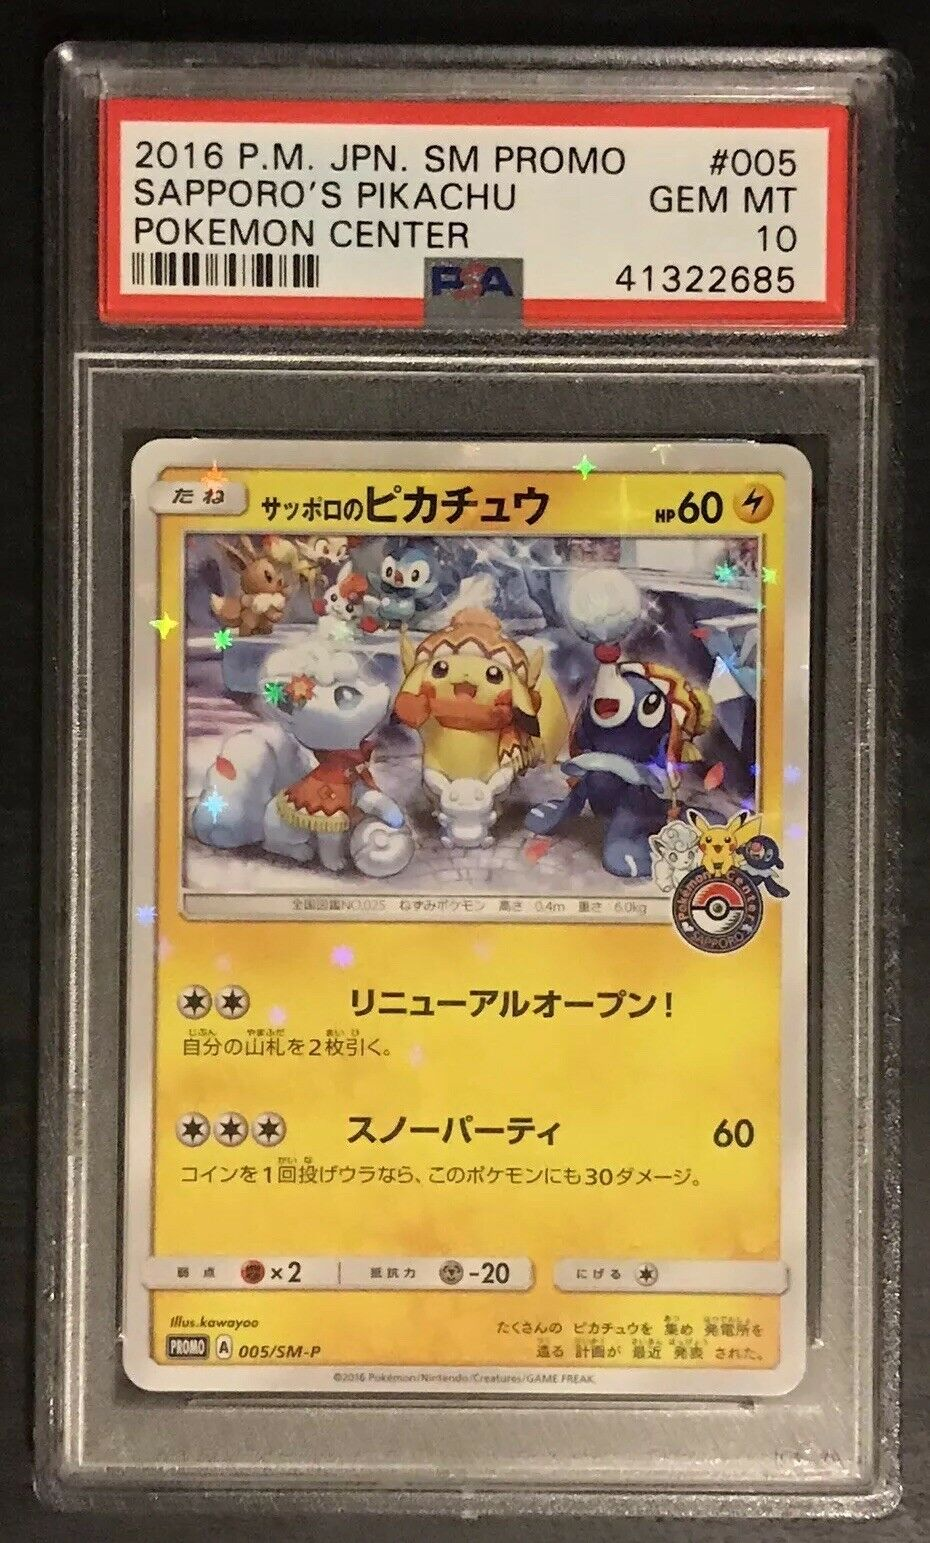 Psa 10 gem - zentrum tokio promo card pokemon pikachu sappGold